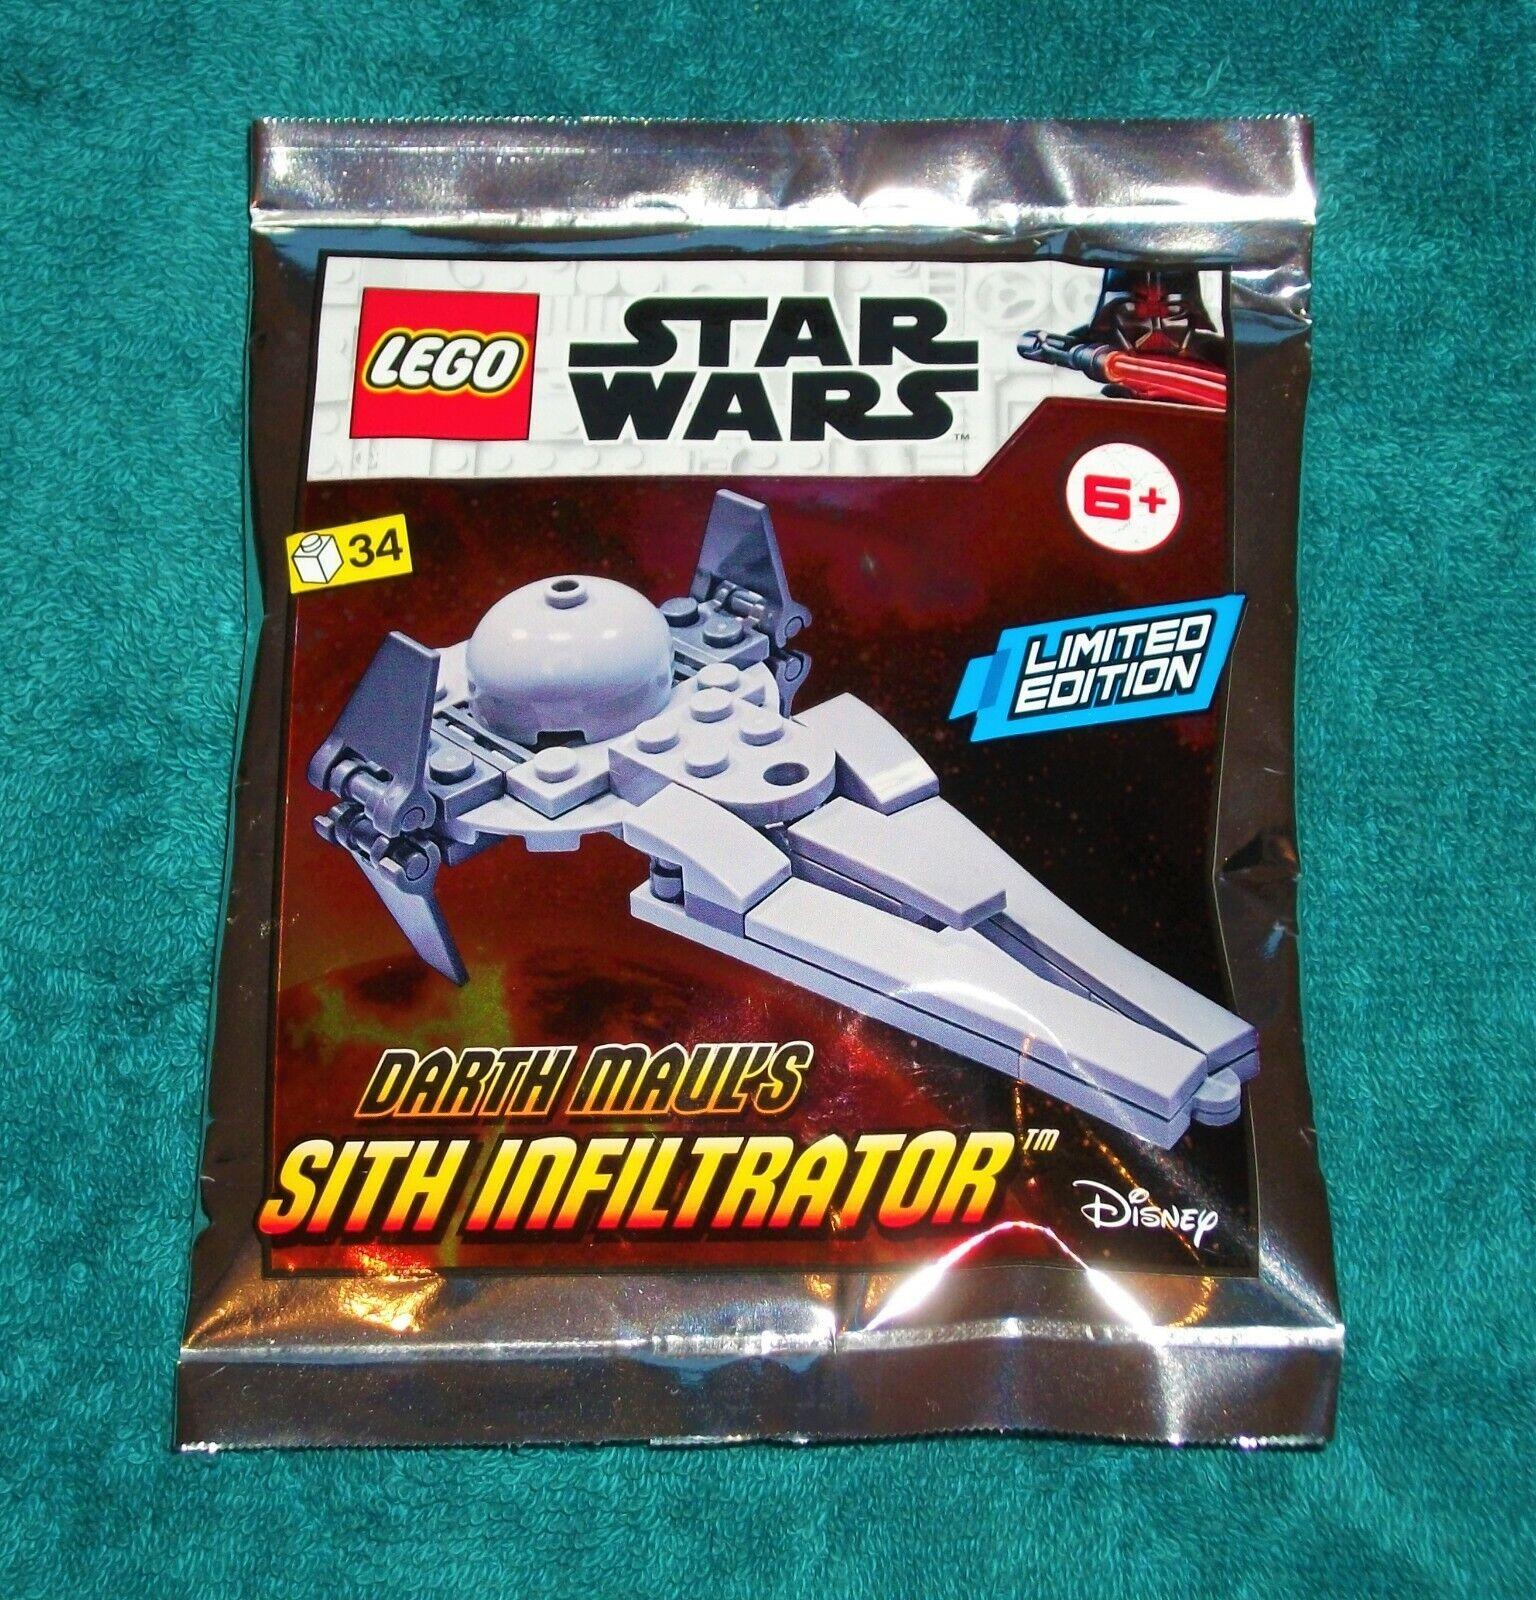 Polybag LEGO® Star Wars Limited Edition 912058 Darth Maul`s Sith Infiltrator